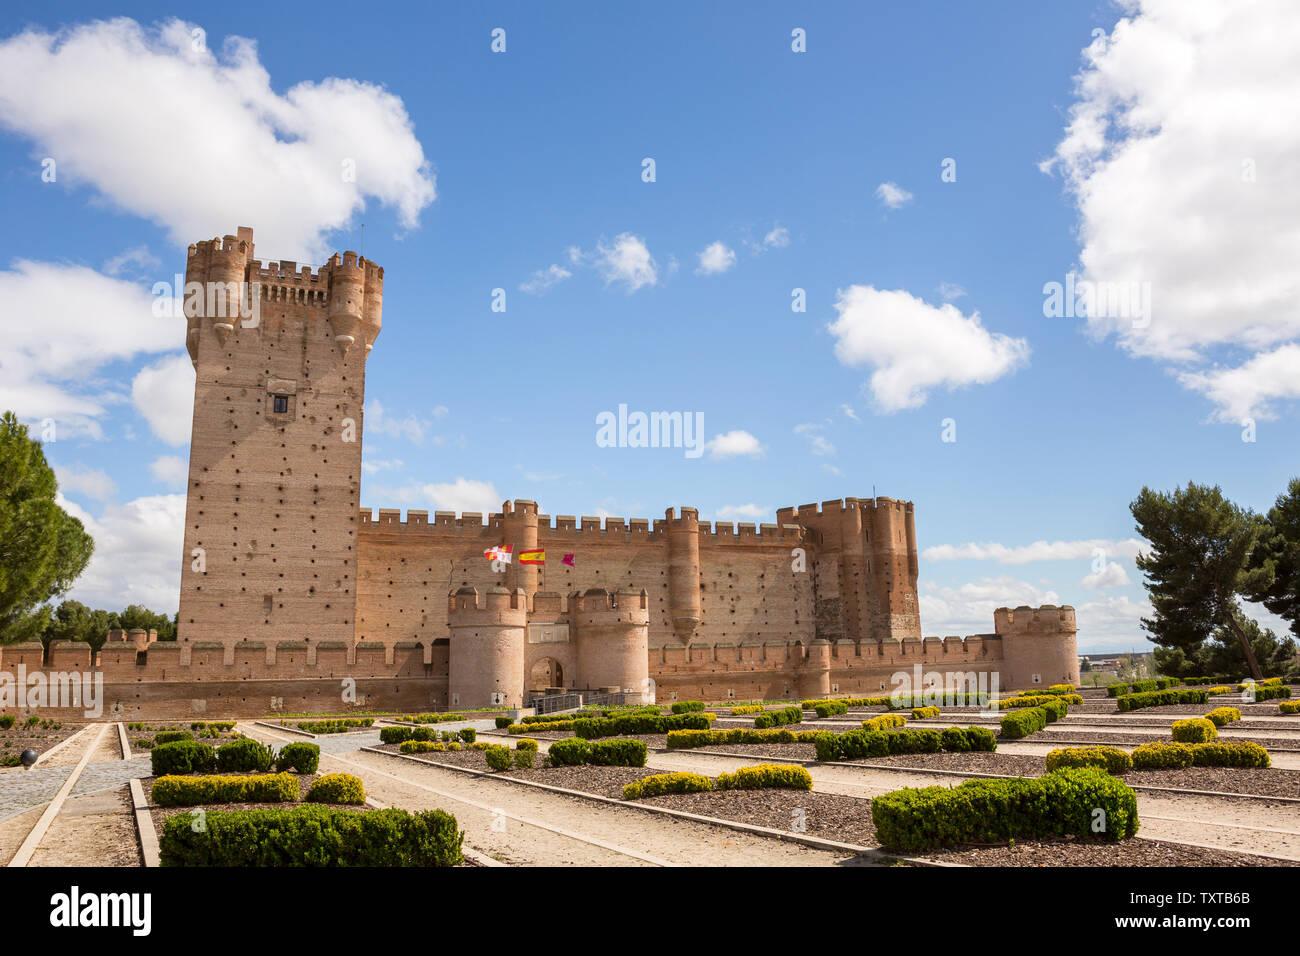 Castillo De La Mota The Castle Of Medina Del Campo In Valladolid